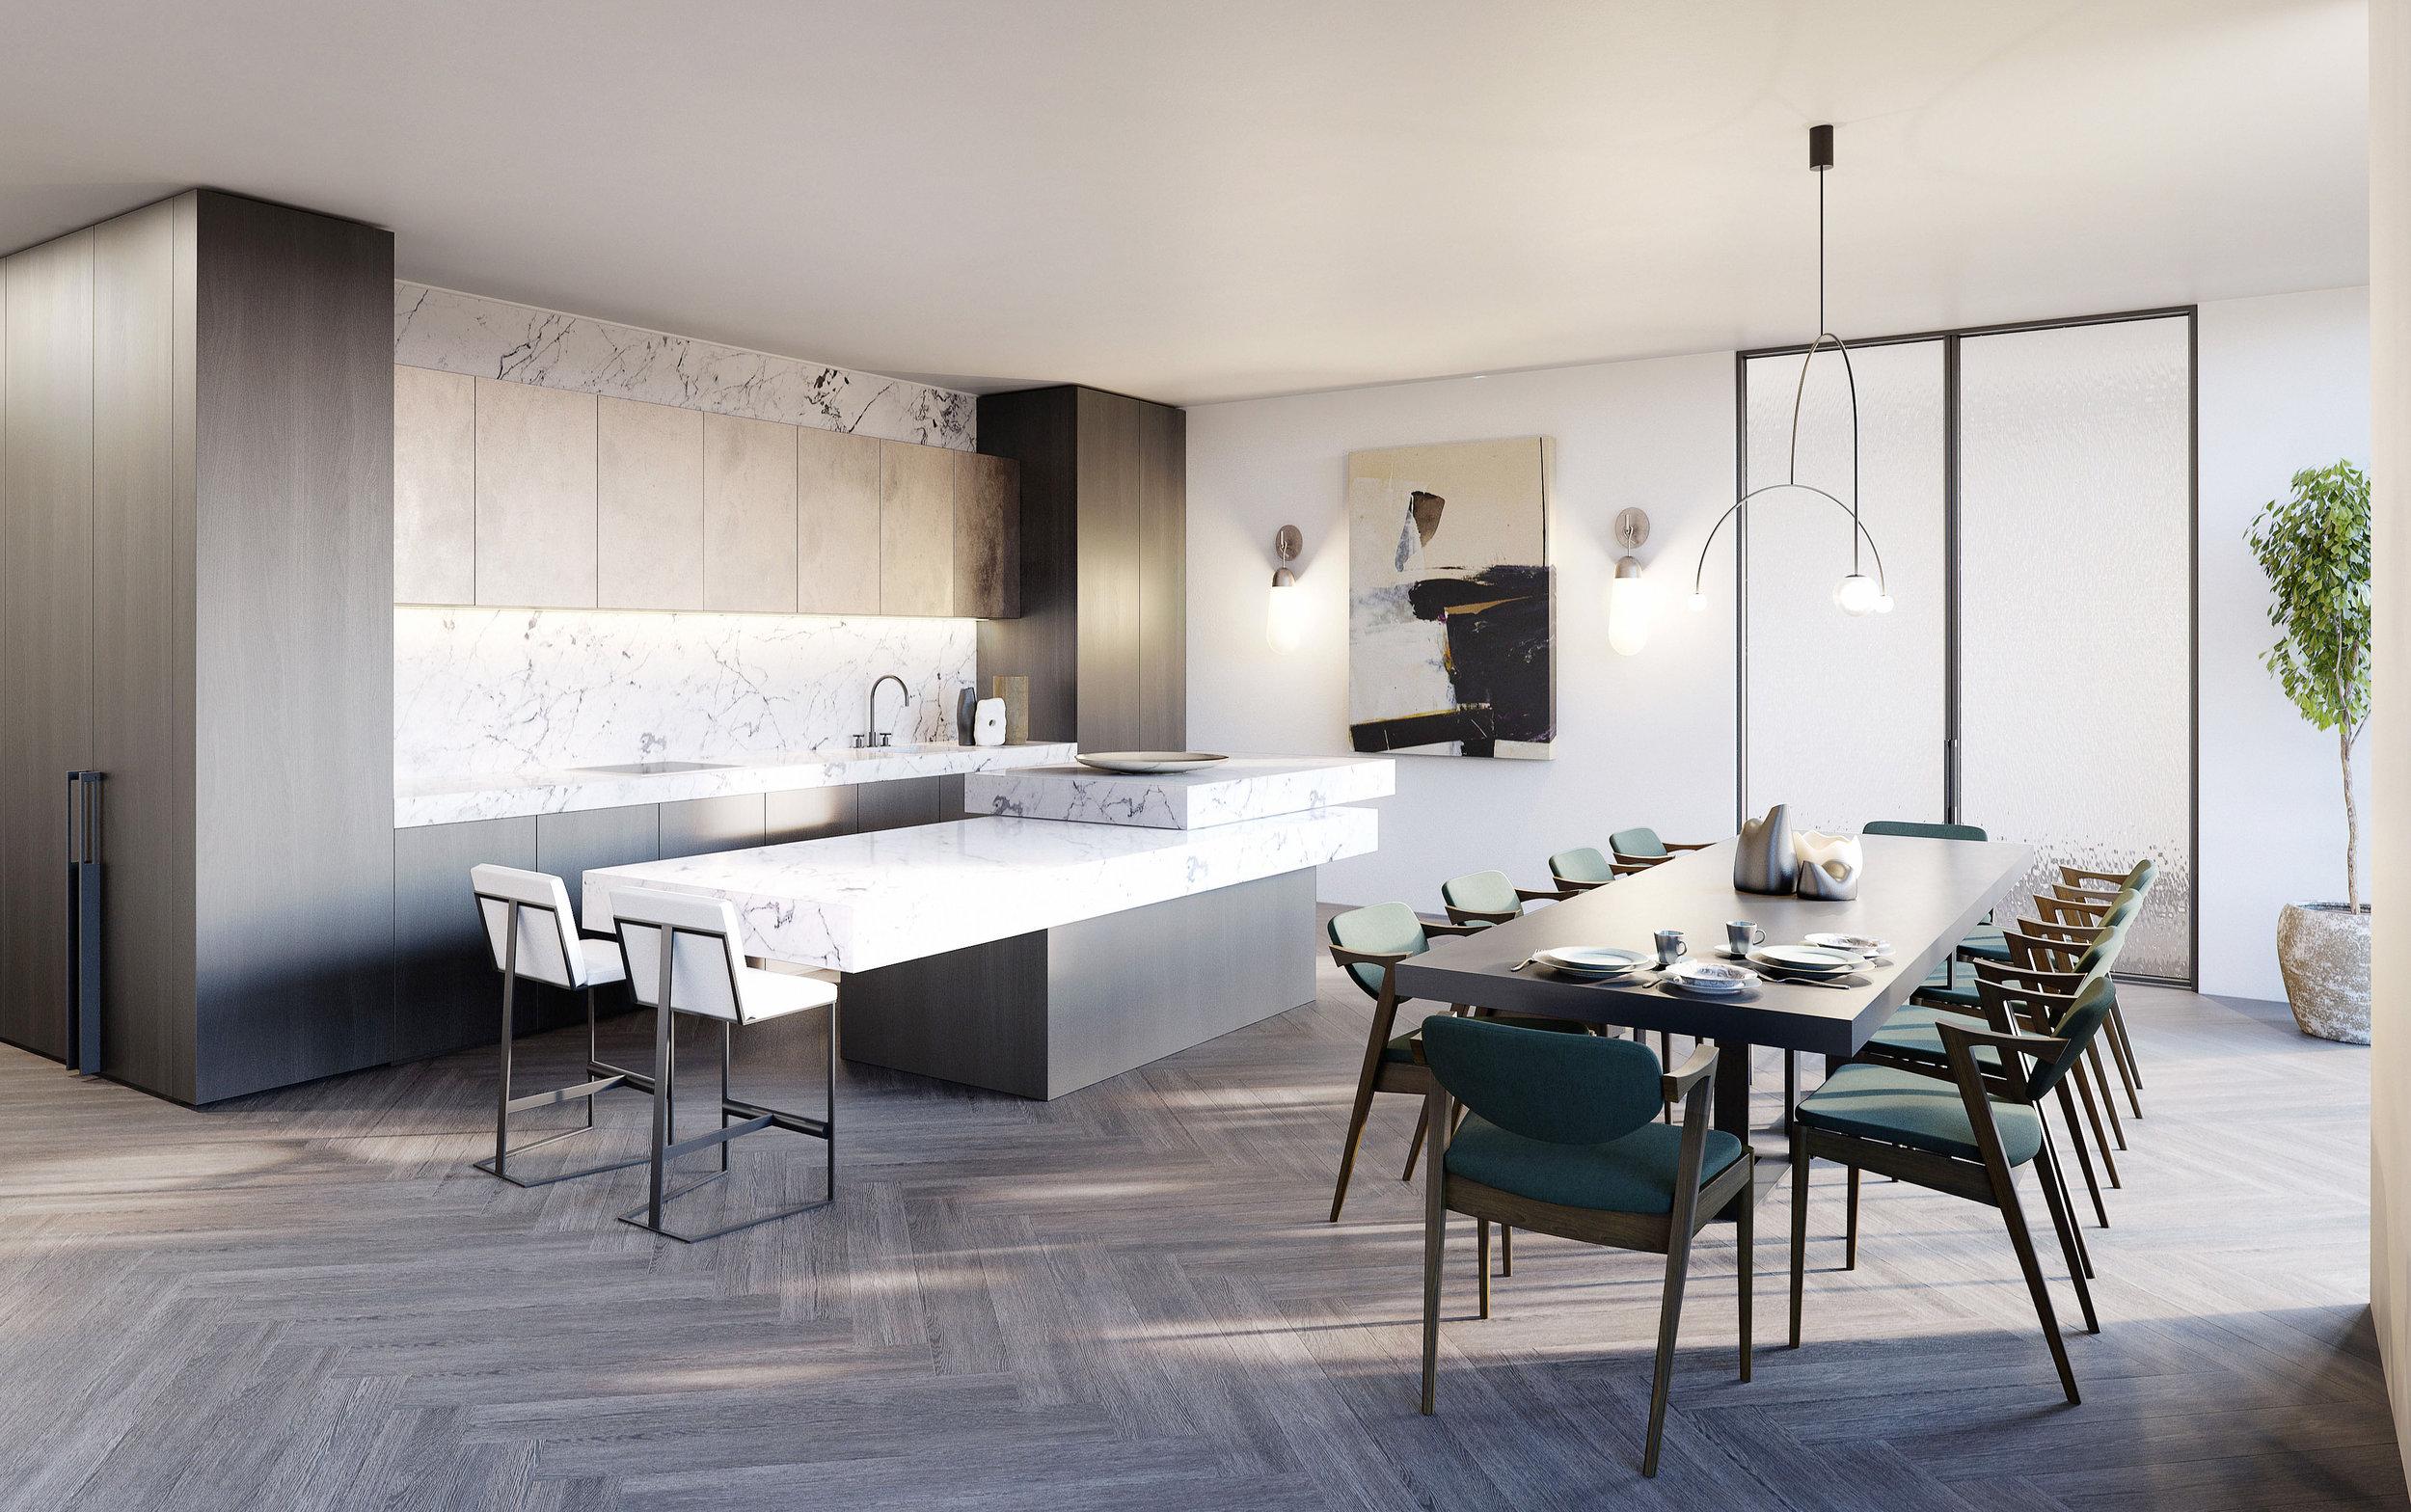 60 st johns wood kitchen CGI